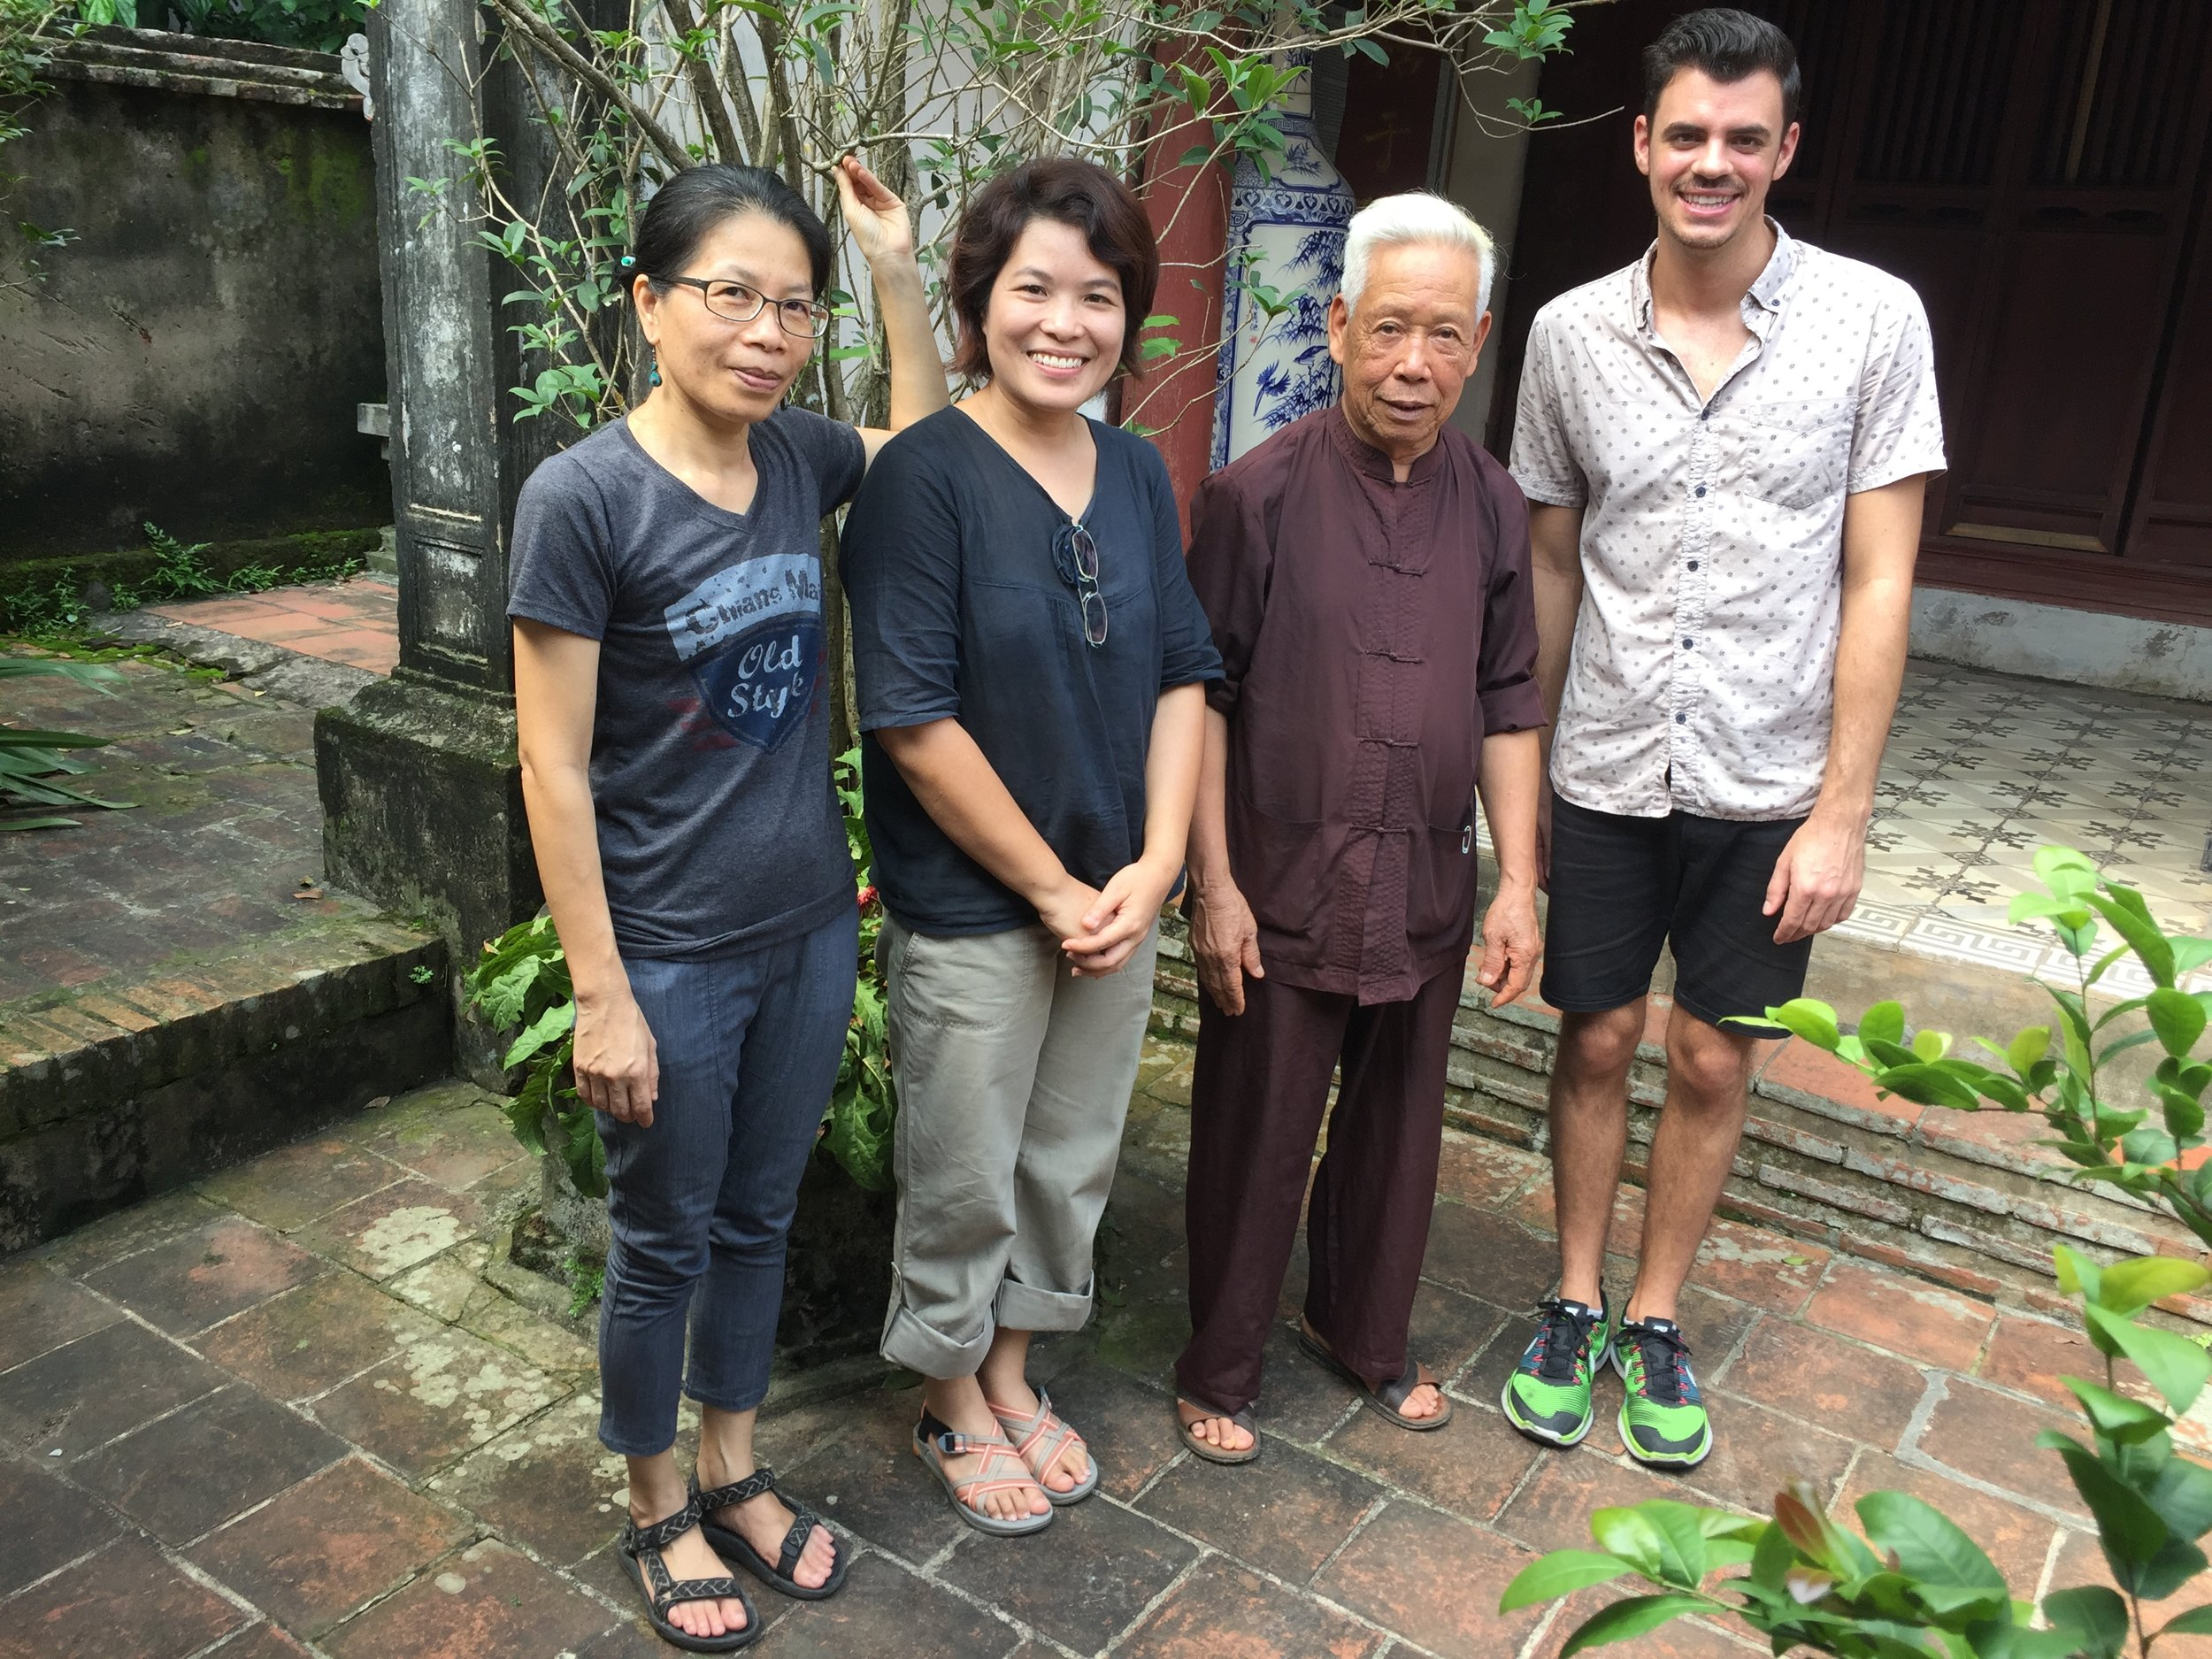 KNOTS researchers with a community member of Duong lam UNESCO Village, Vietnam